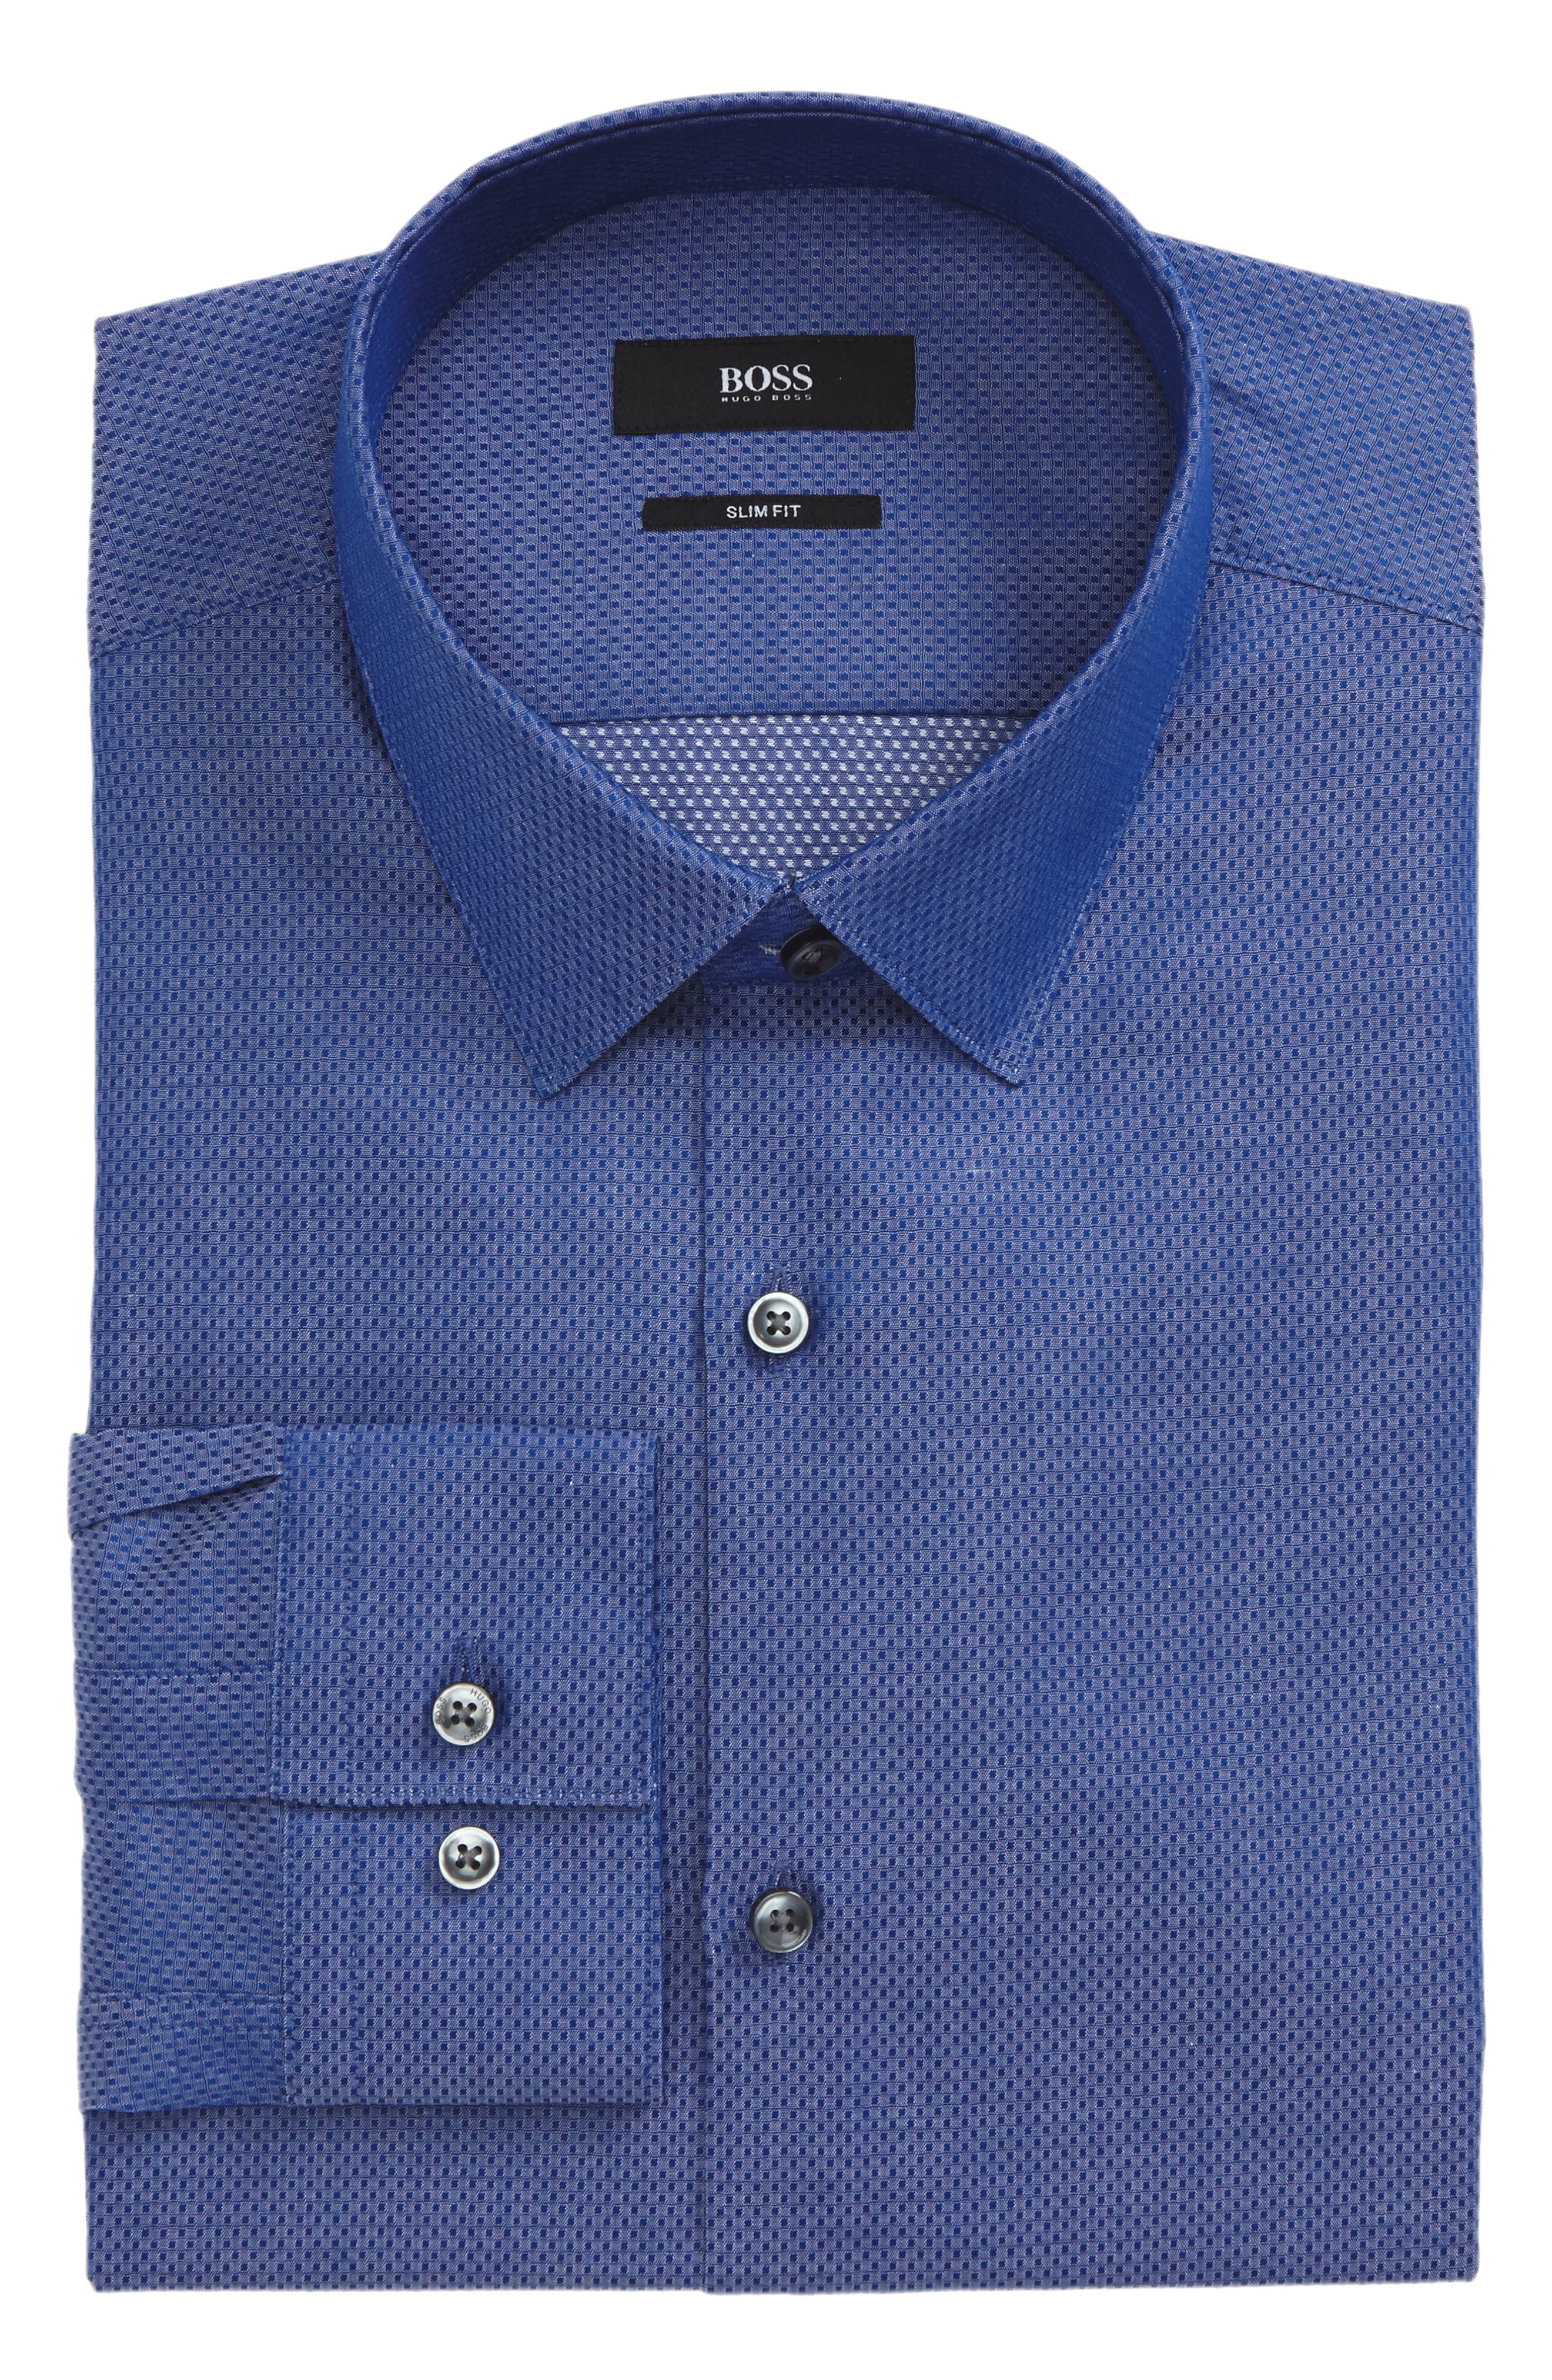 Isko Slim Fit Textured Dress Shirt,                         Main,                         color, 421